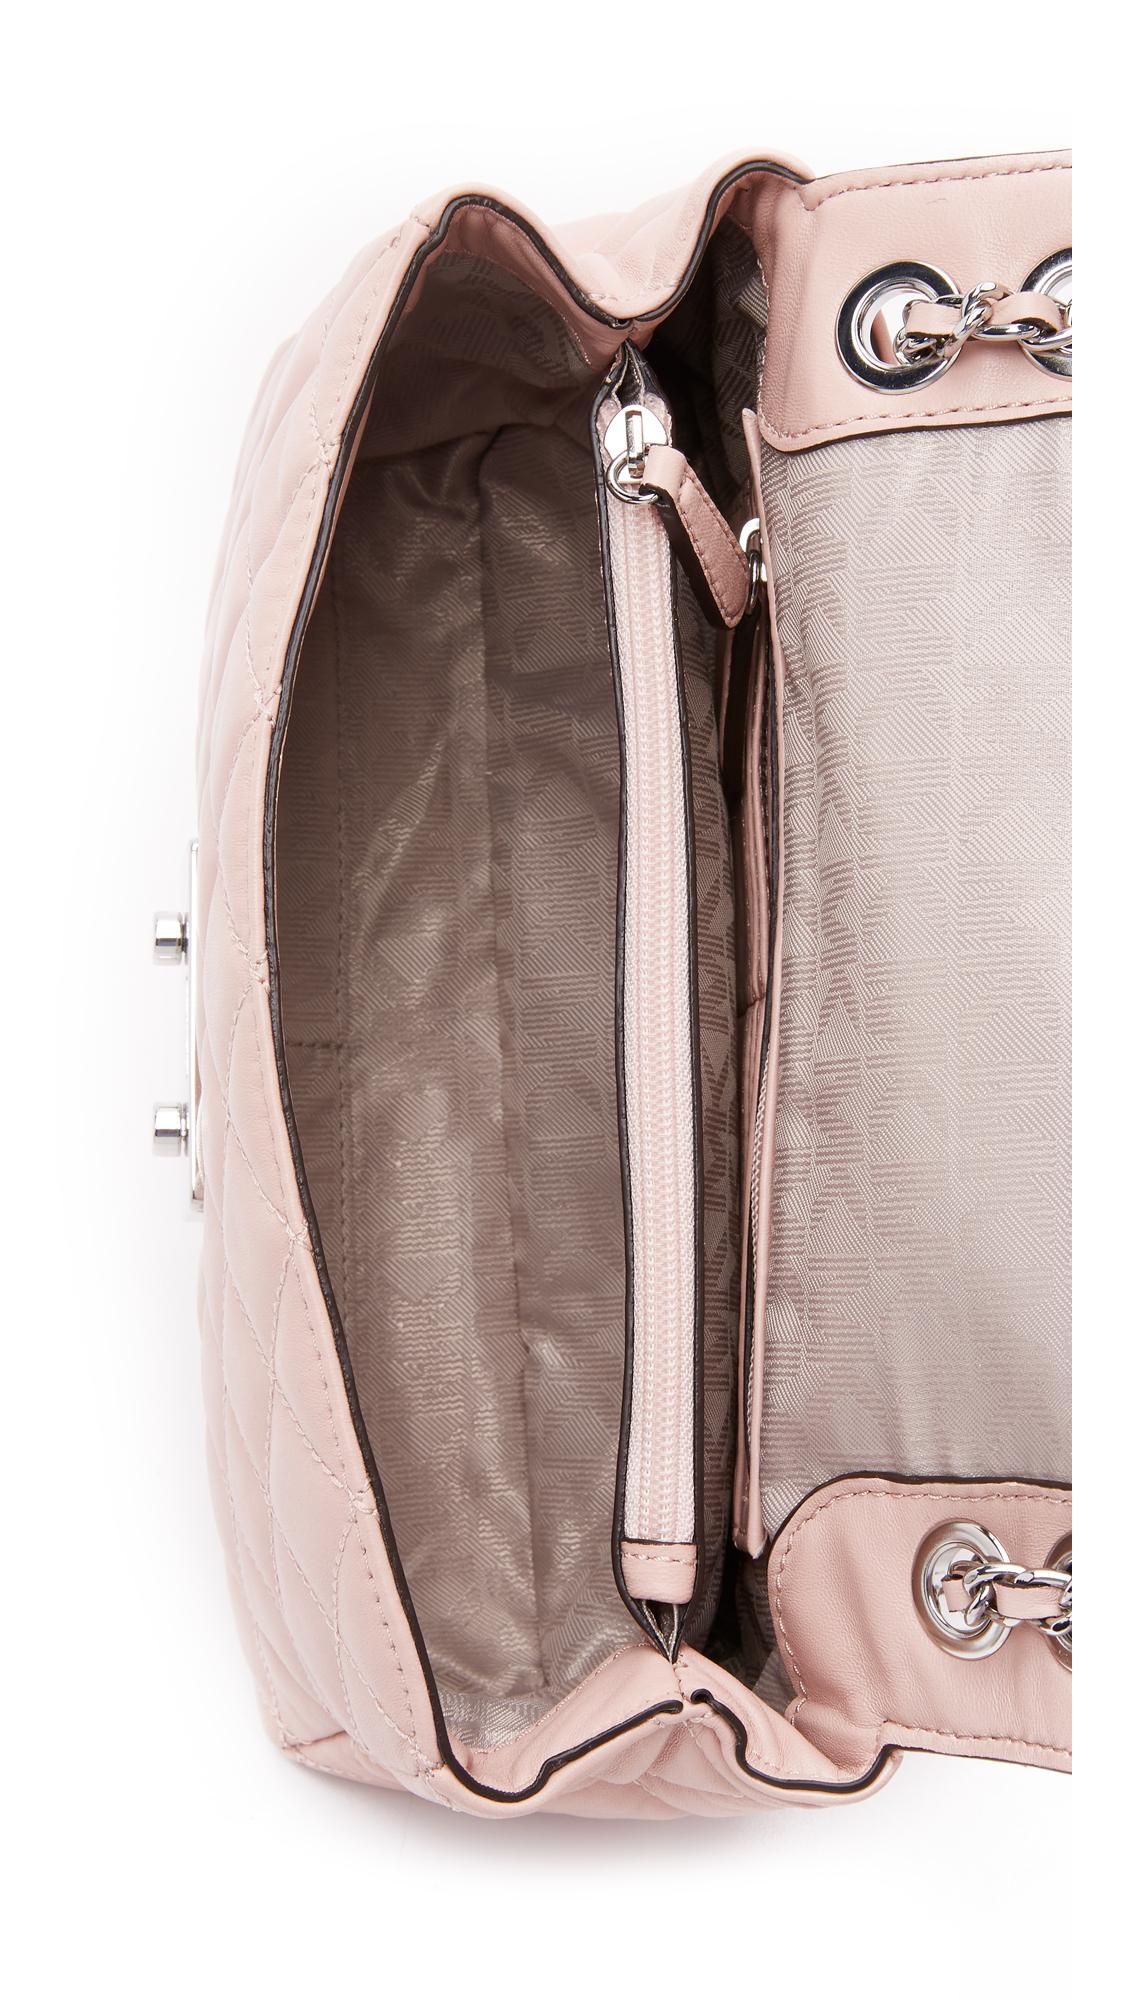 21c2e0007866 MICHAEL Michael Kors Sloan Large Chain Shoulder Bag